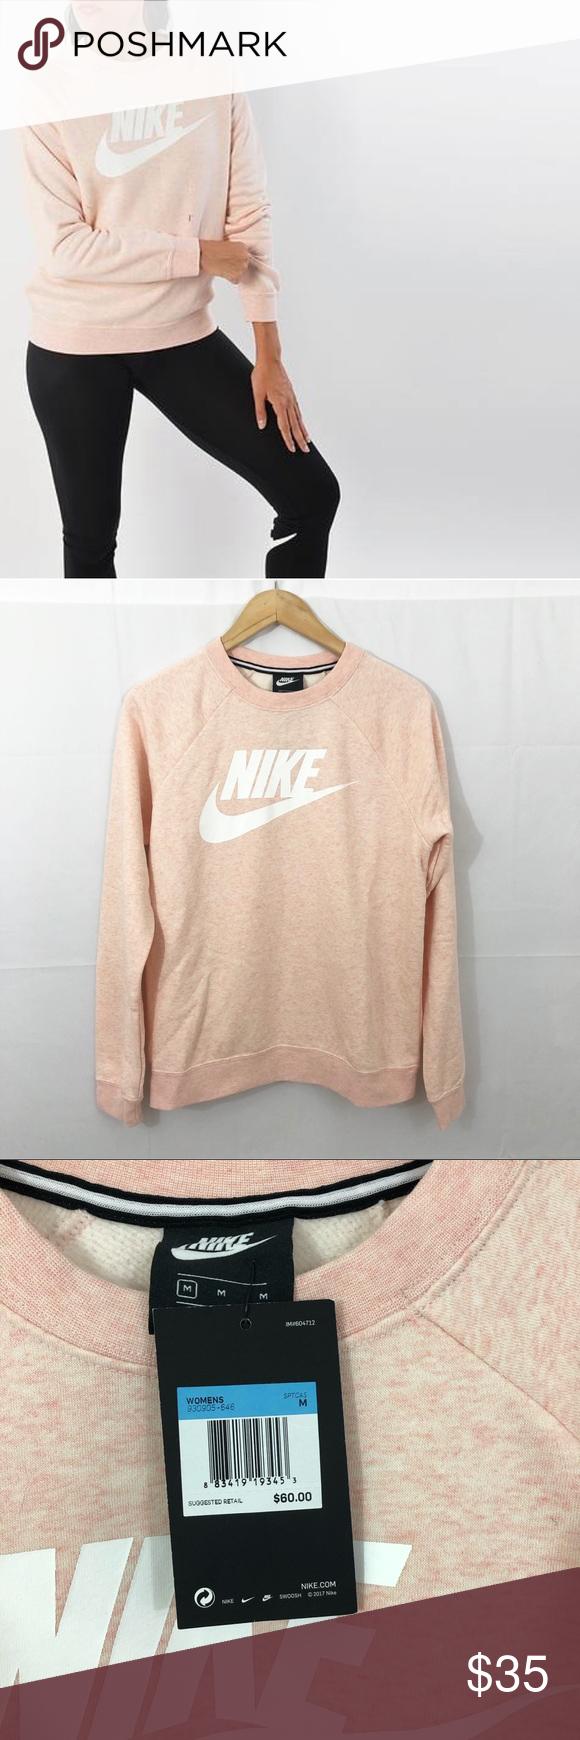 Nike Pink Heathered Crewneck Pullover Sweatshirt M Sweatshirts Pullover Sweatshirt Pullover [ 1740 x 580 Pixel ]